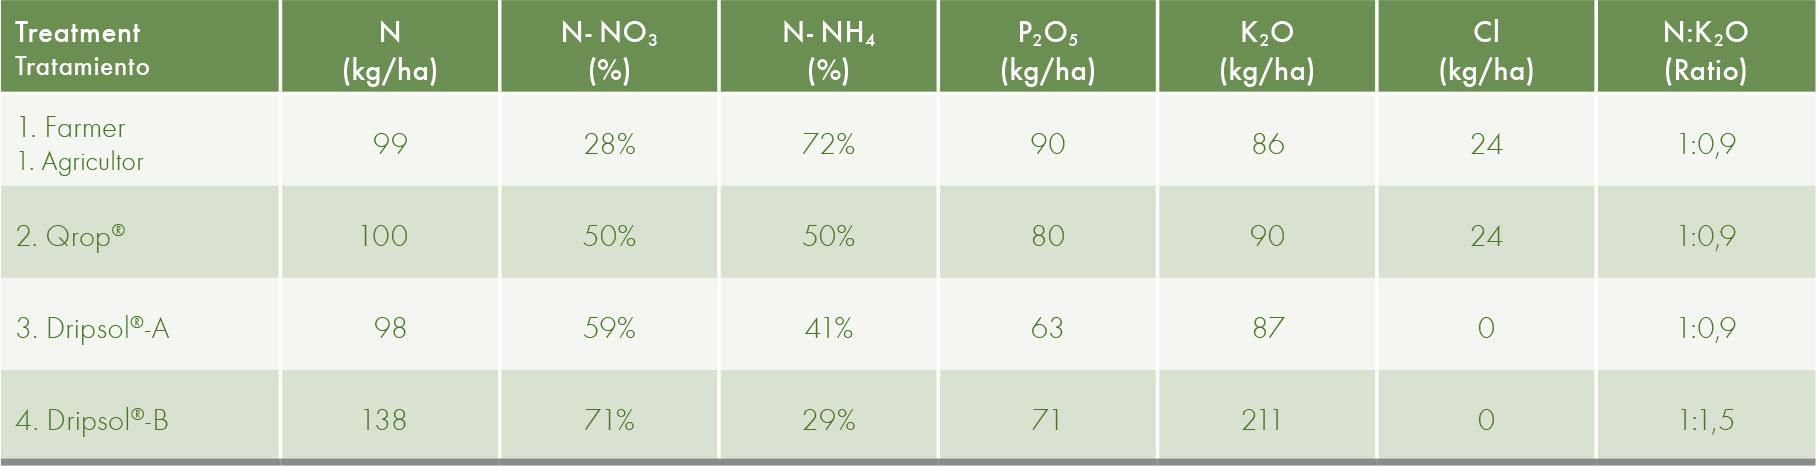 Total nutrients supplied with each fertiliser programme.